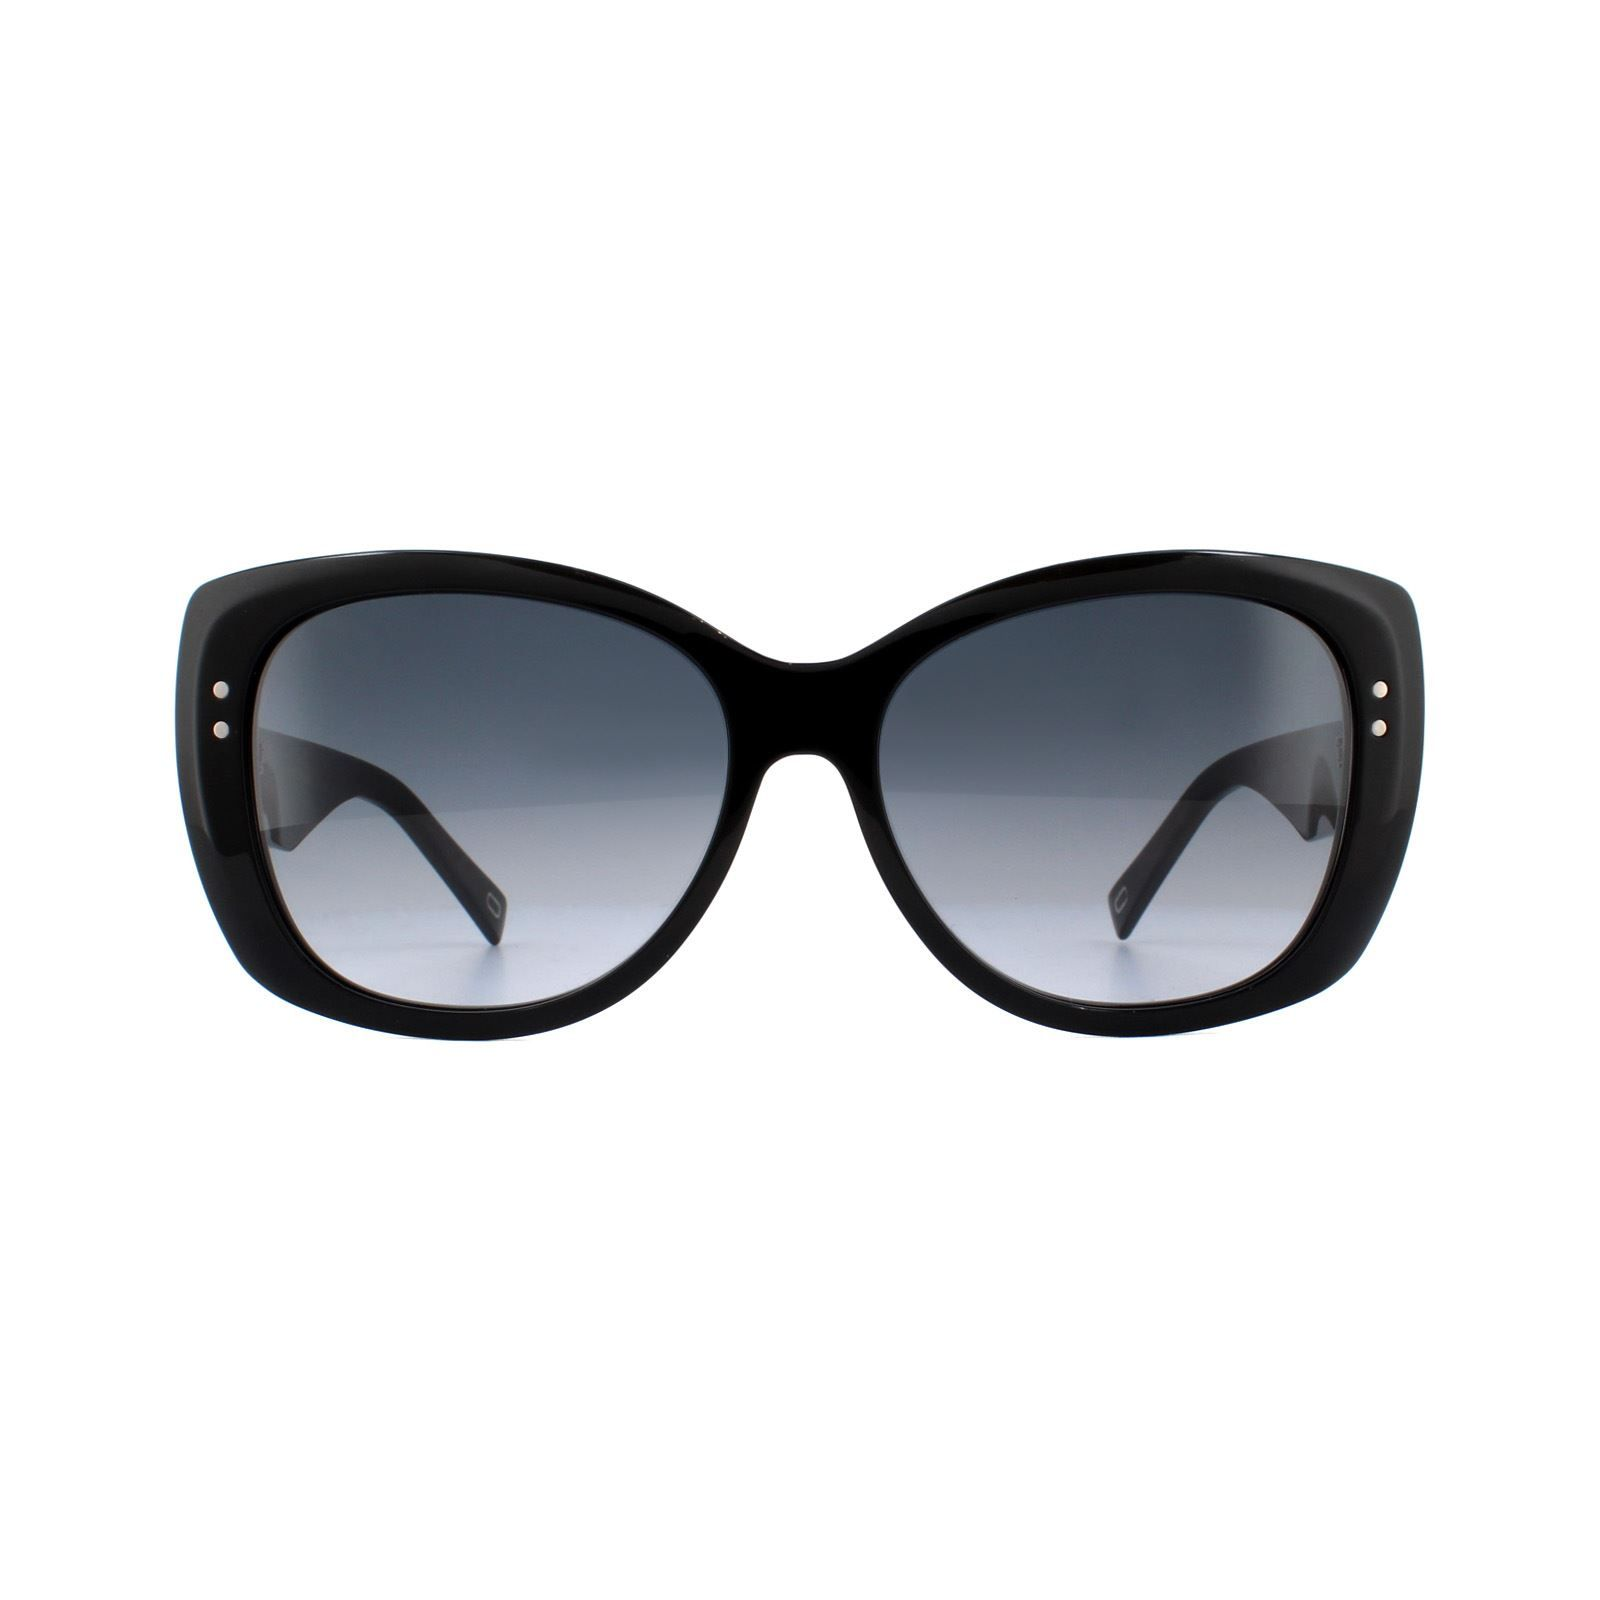 Marc Jacobs Sunglasses MARC 121/F/S 807 HD Black Grey Gradient